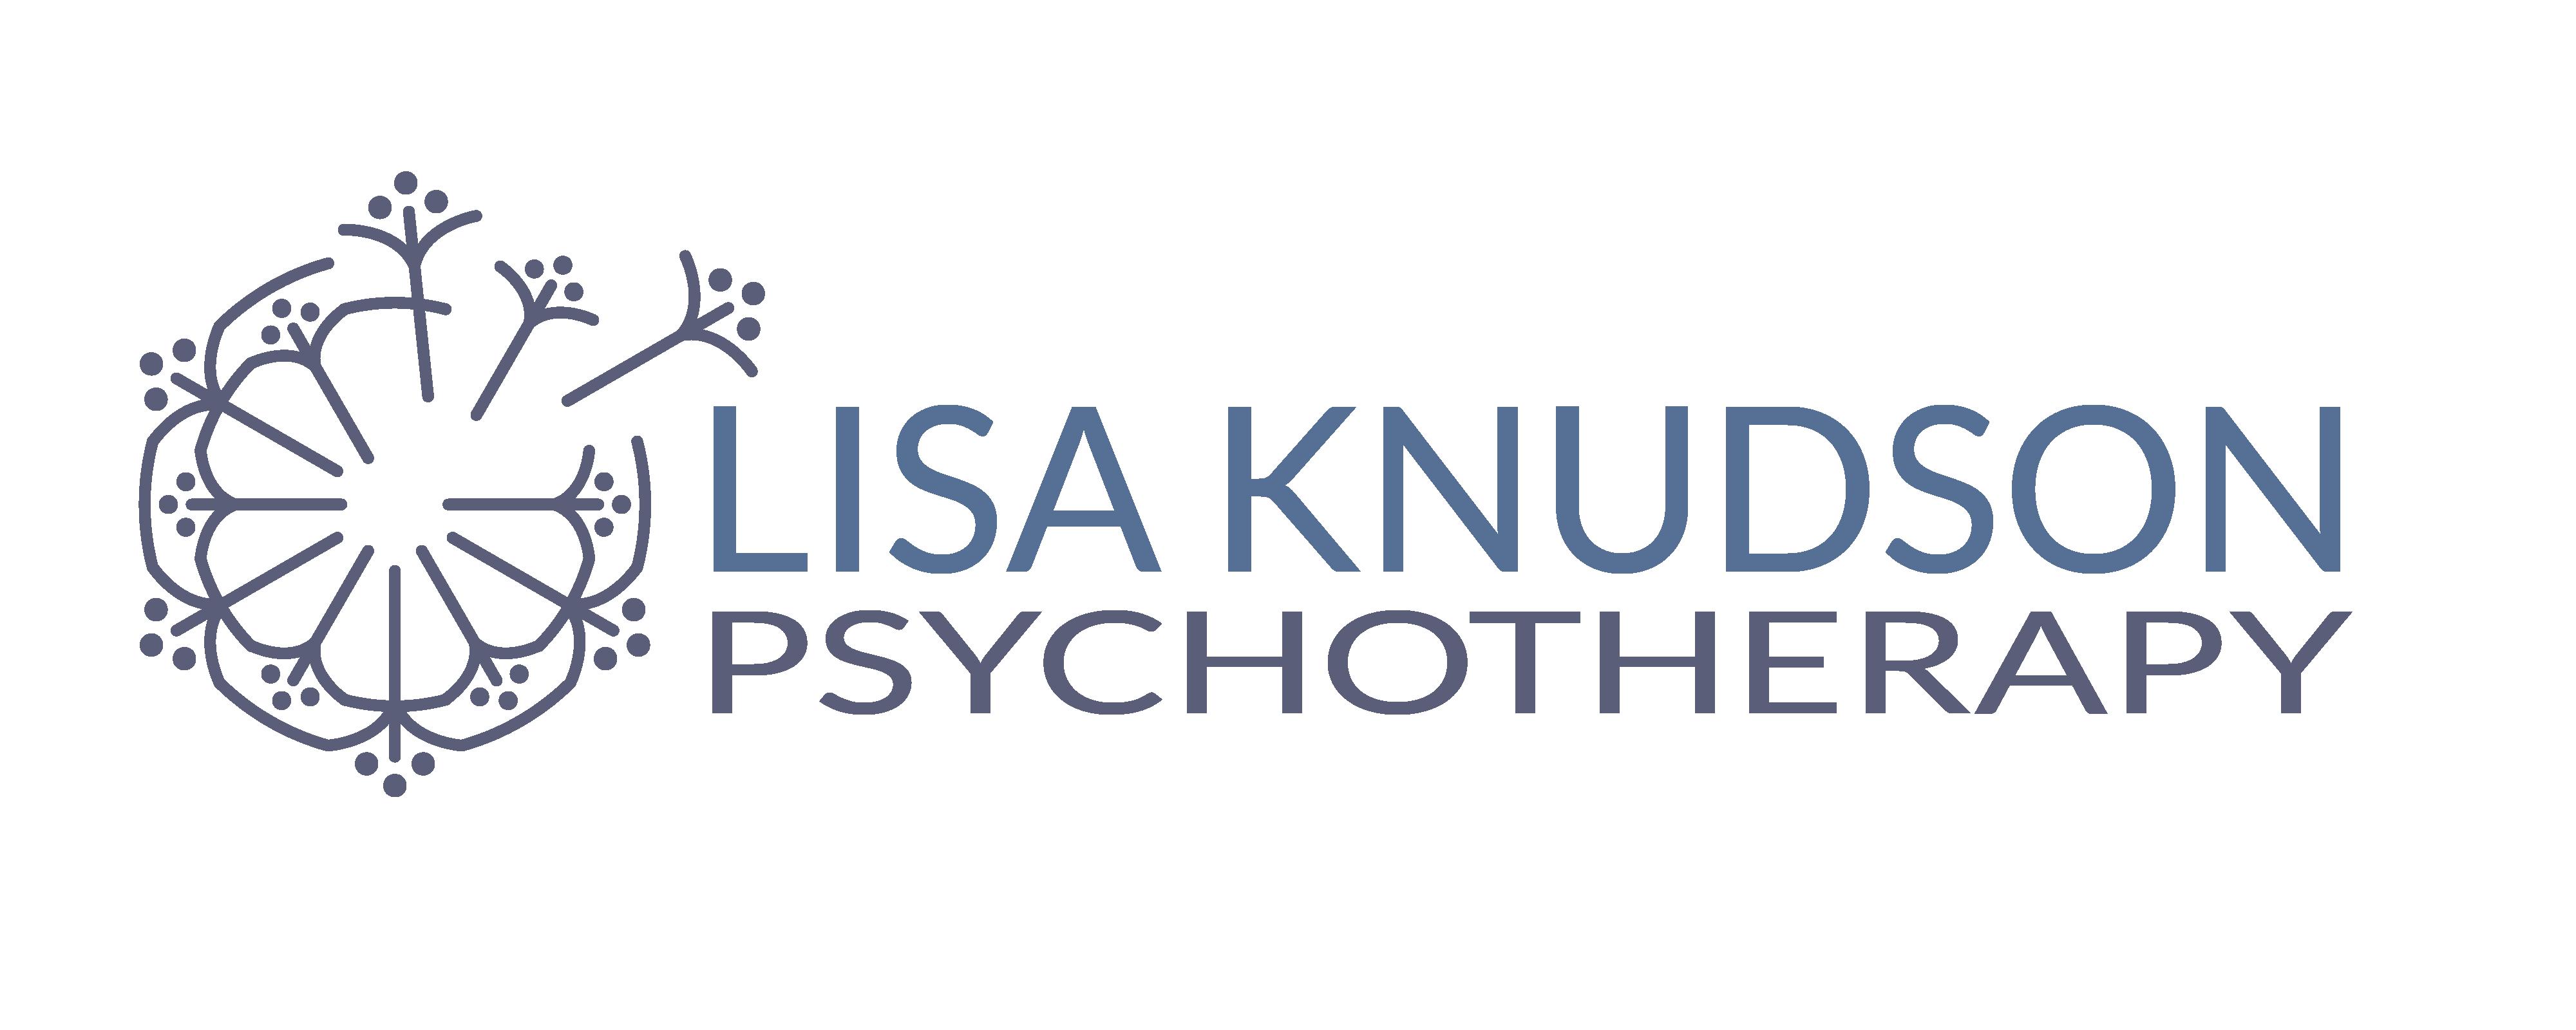 Lisa Knudson Psychotherapy